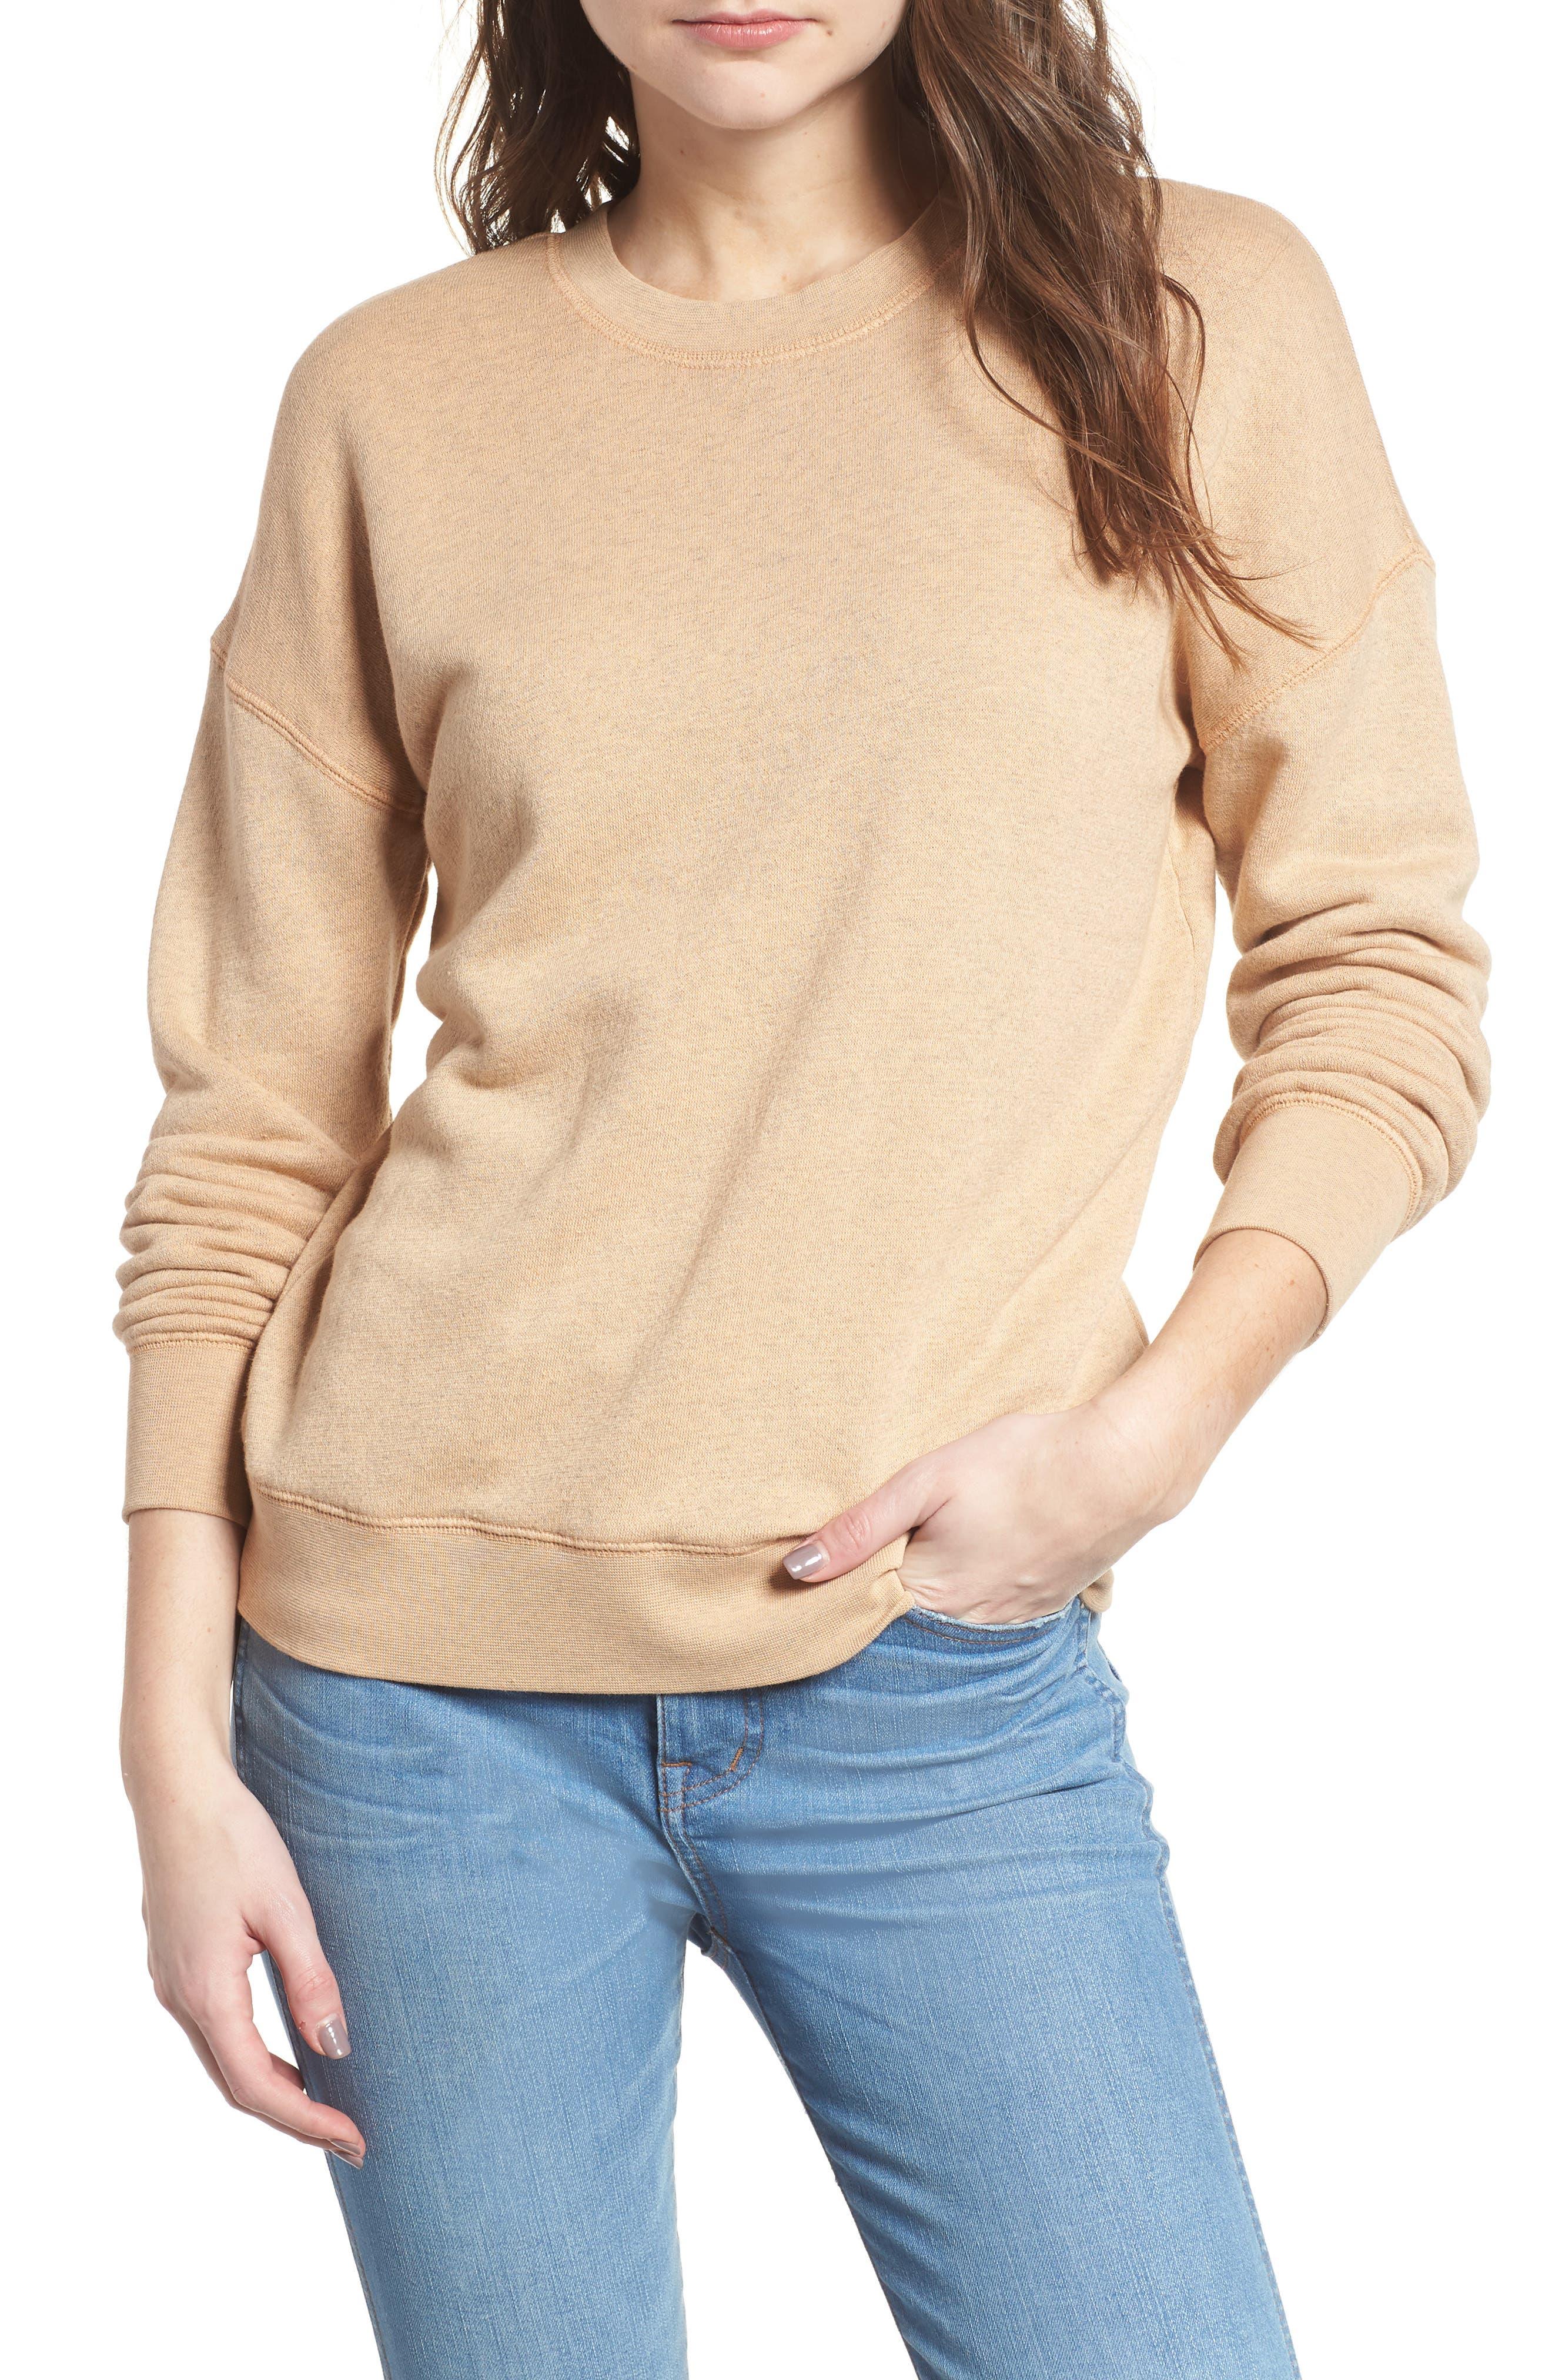 Mainstay Sweatshirt,                         Main,                         color, Hthr Dune